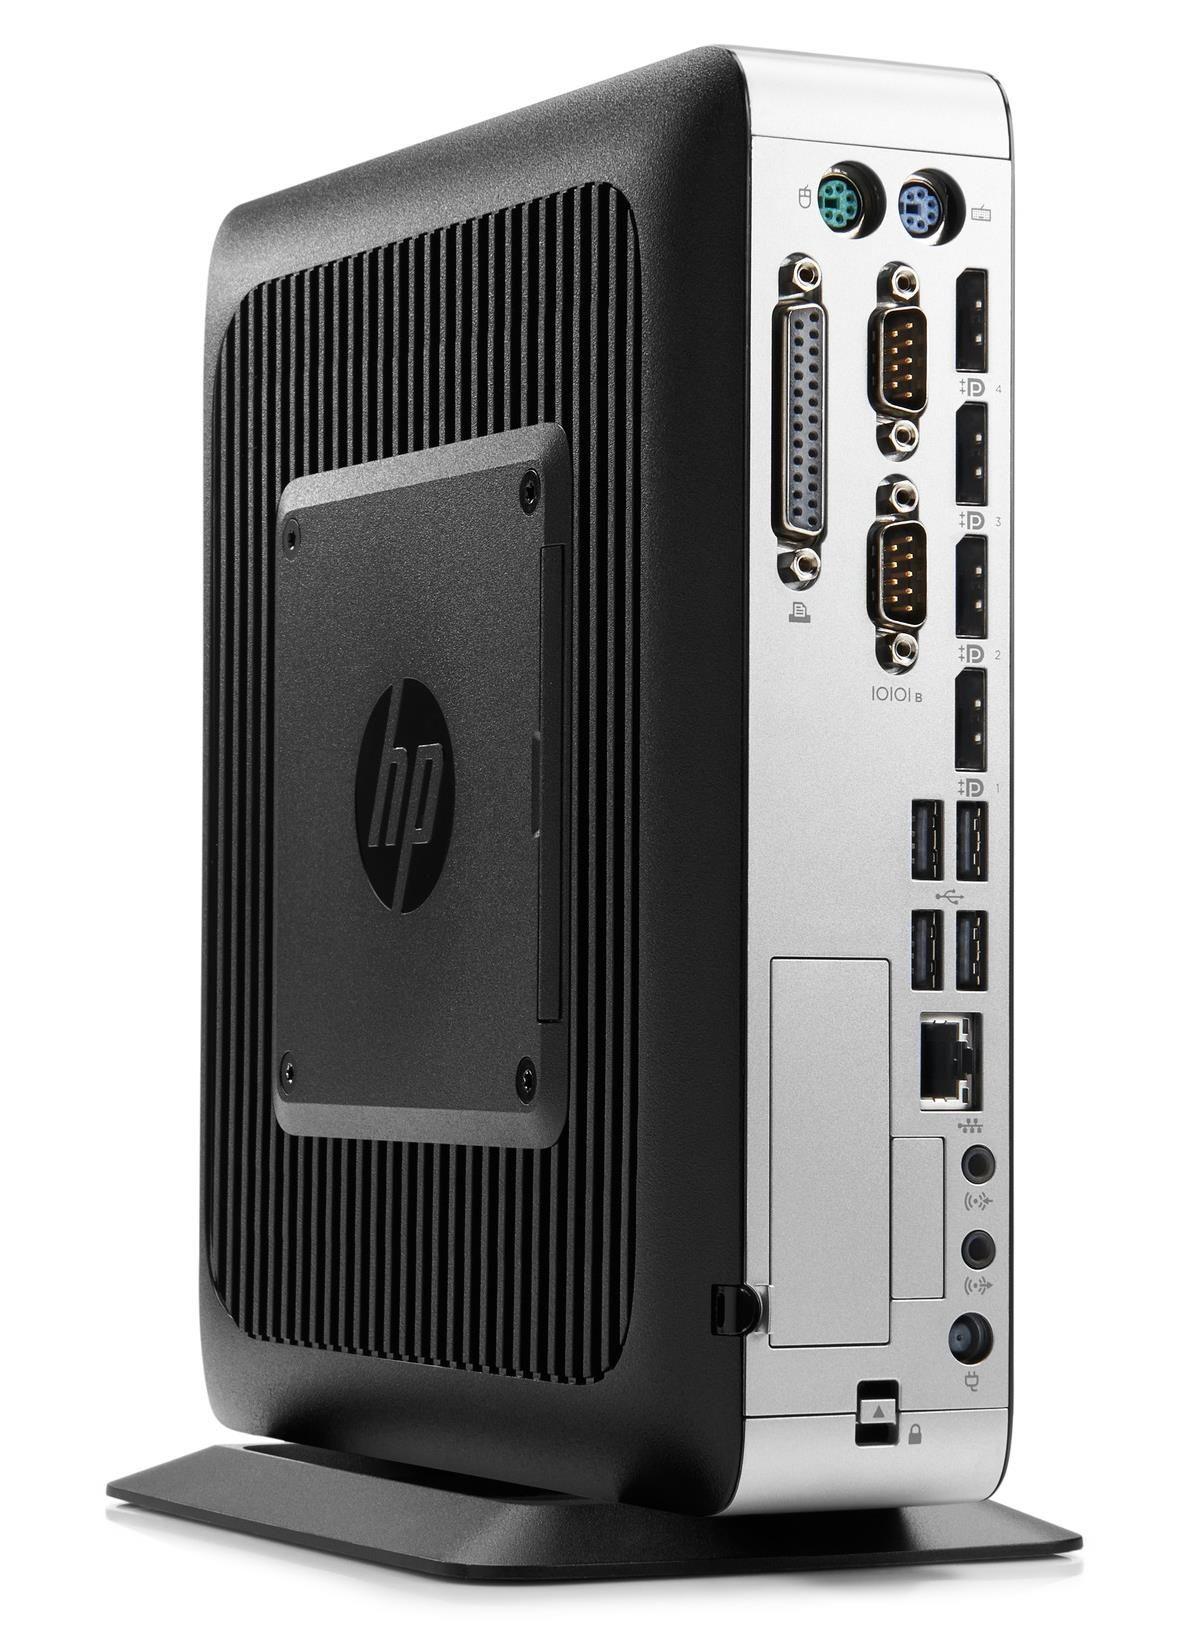 HP t730 Thin Client Quad Core (RX-427BB) 2.7GHz 4GB 16GB Flash LAN HP ThinPro (Radeon HD 9000)